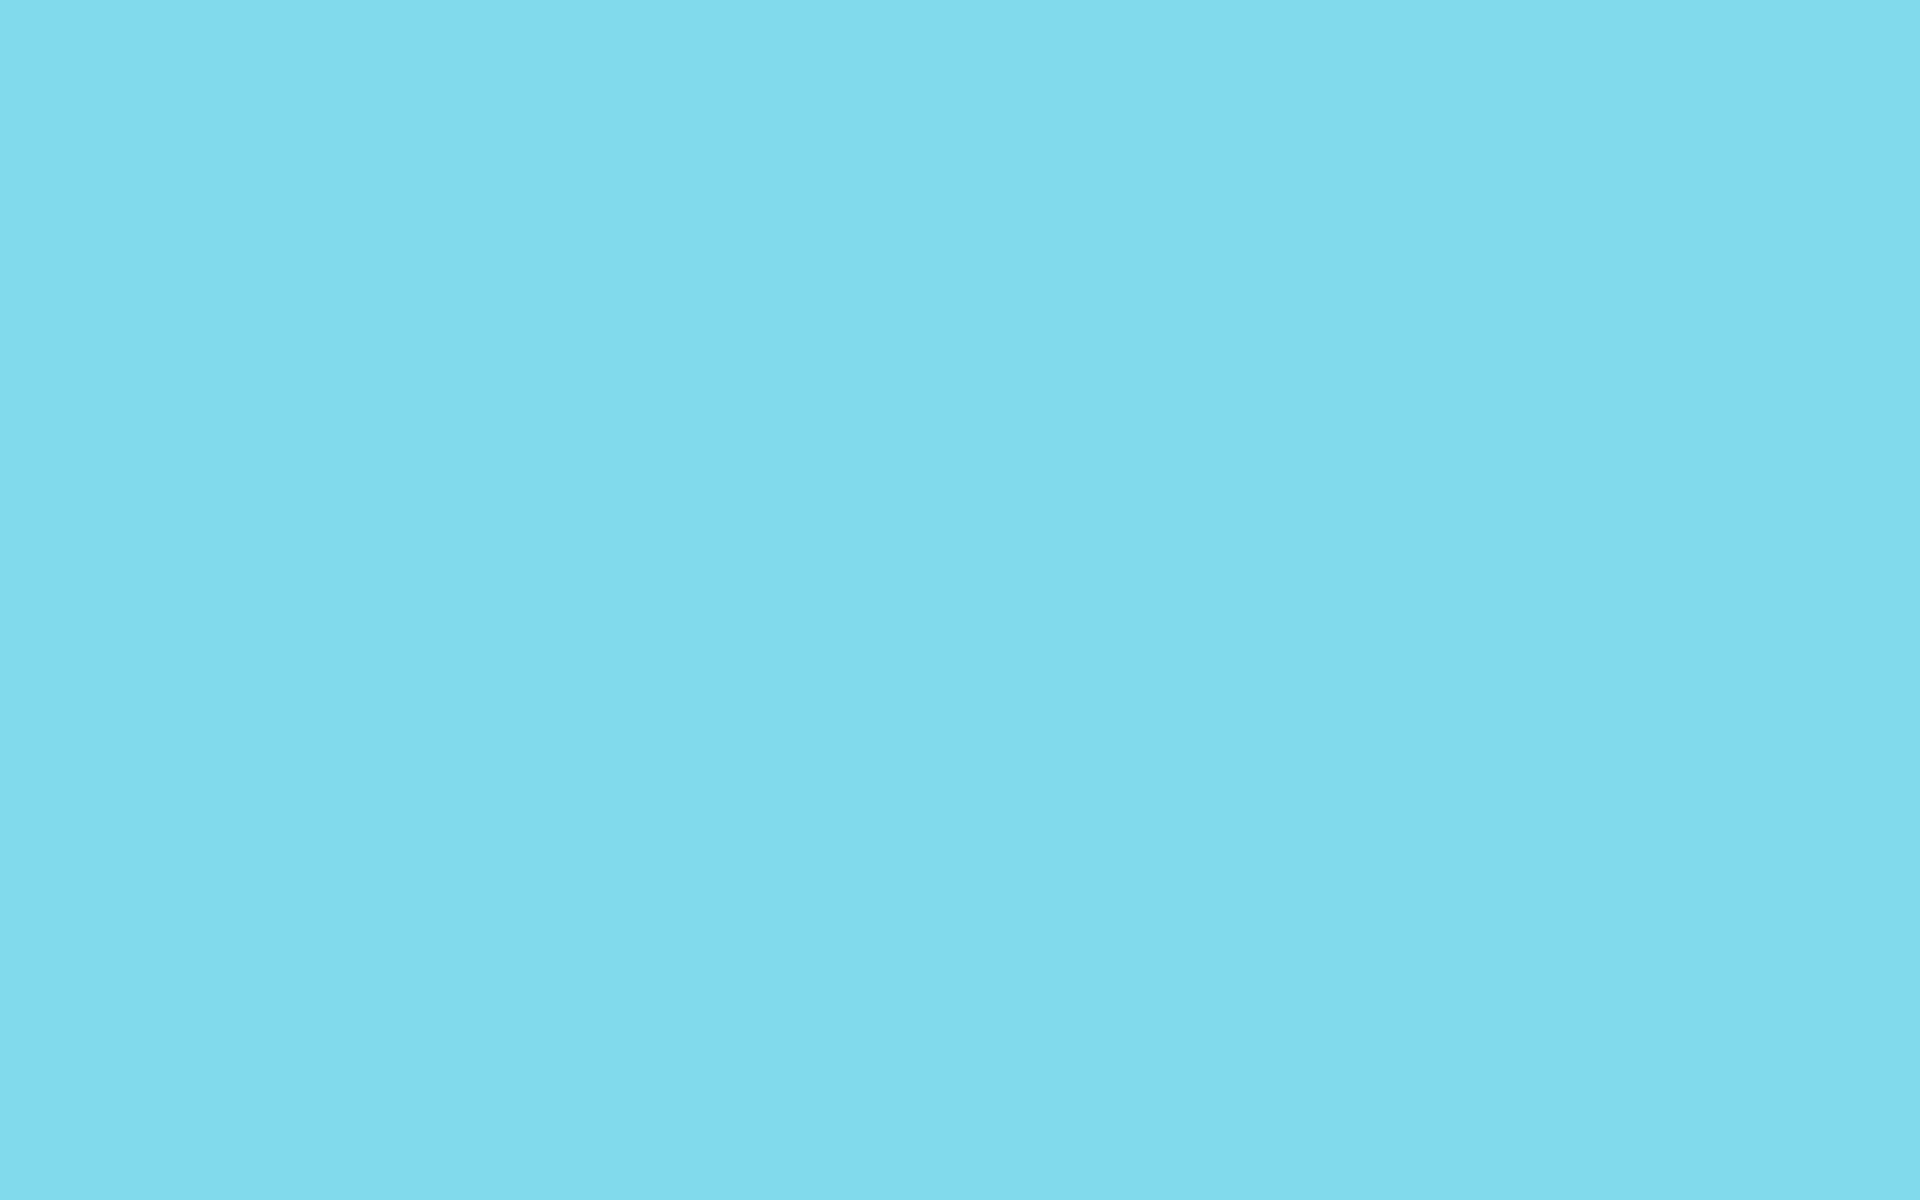 1920x1200 Medium Sky Blue Solid Color Background